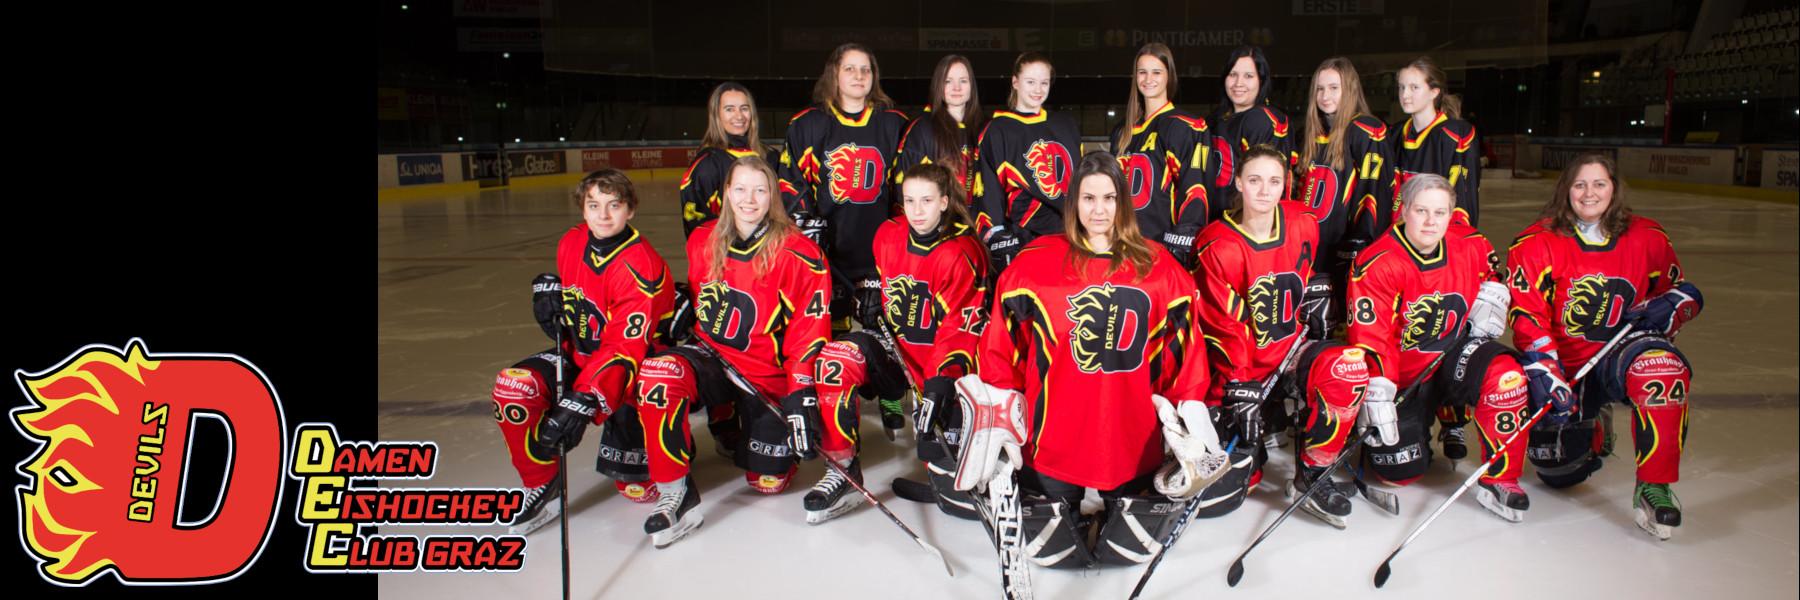 Devils Team